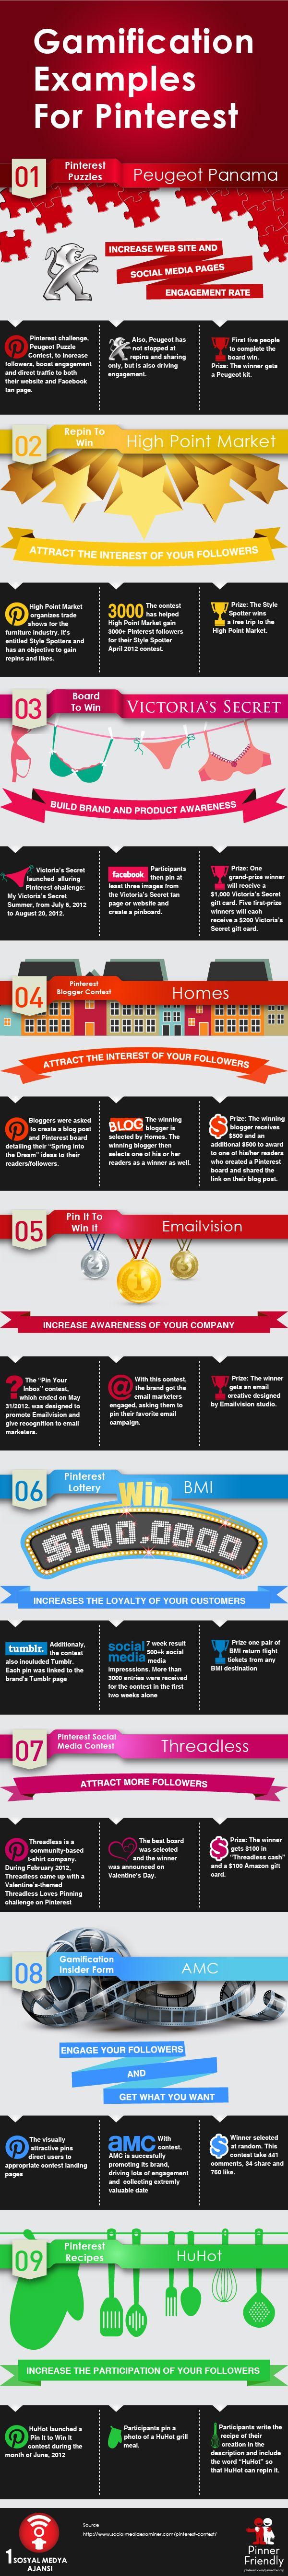 Ejemplos de gamificación para Pinterest | Gamification examples for Pinterest